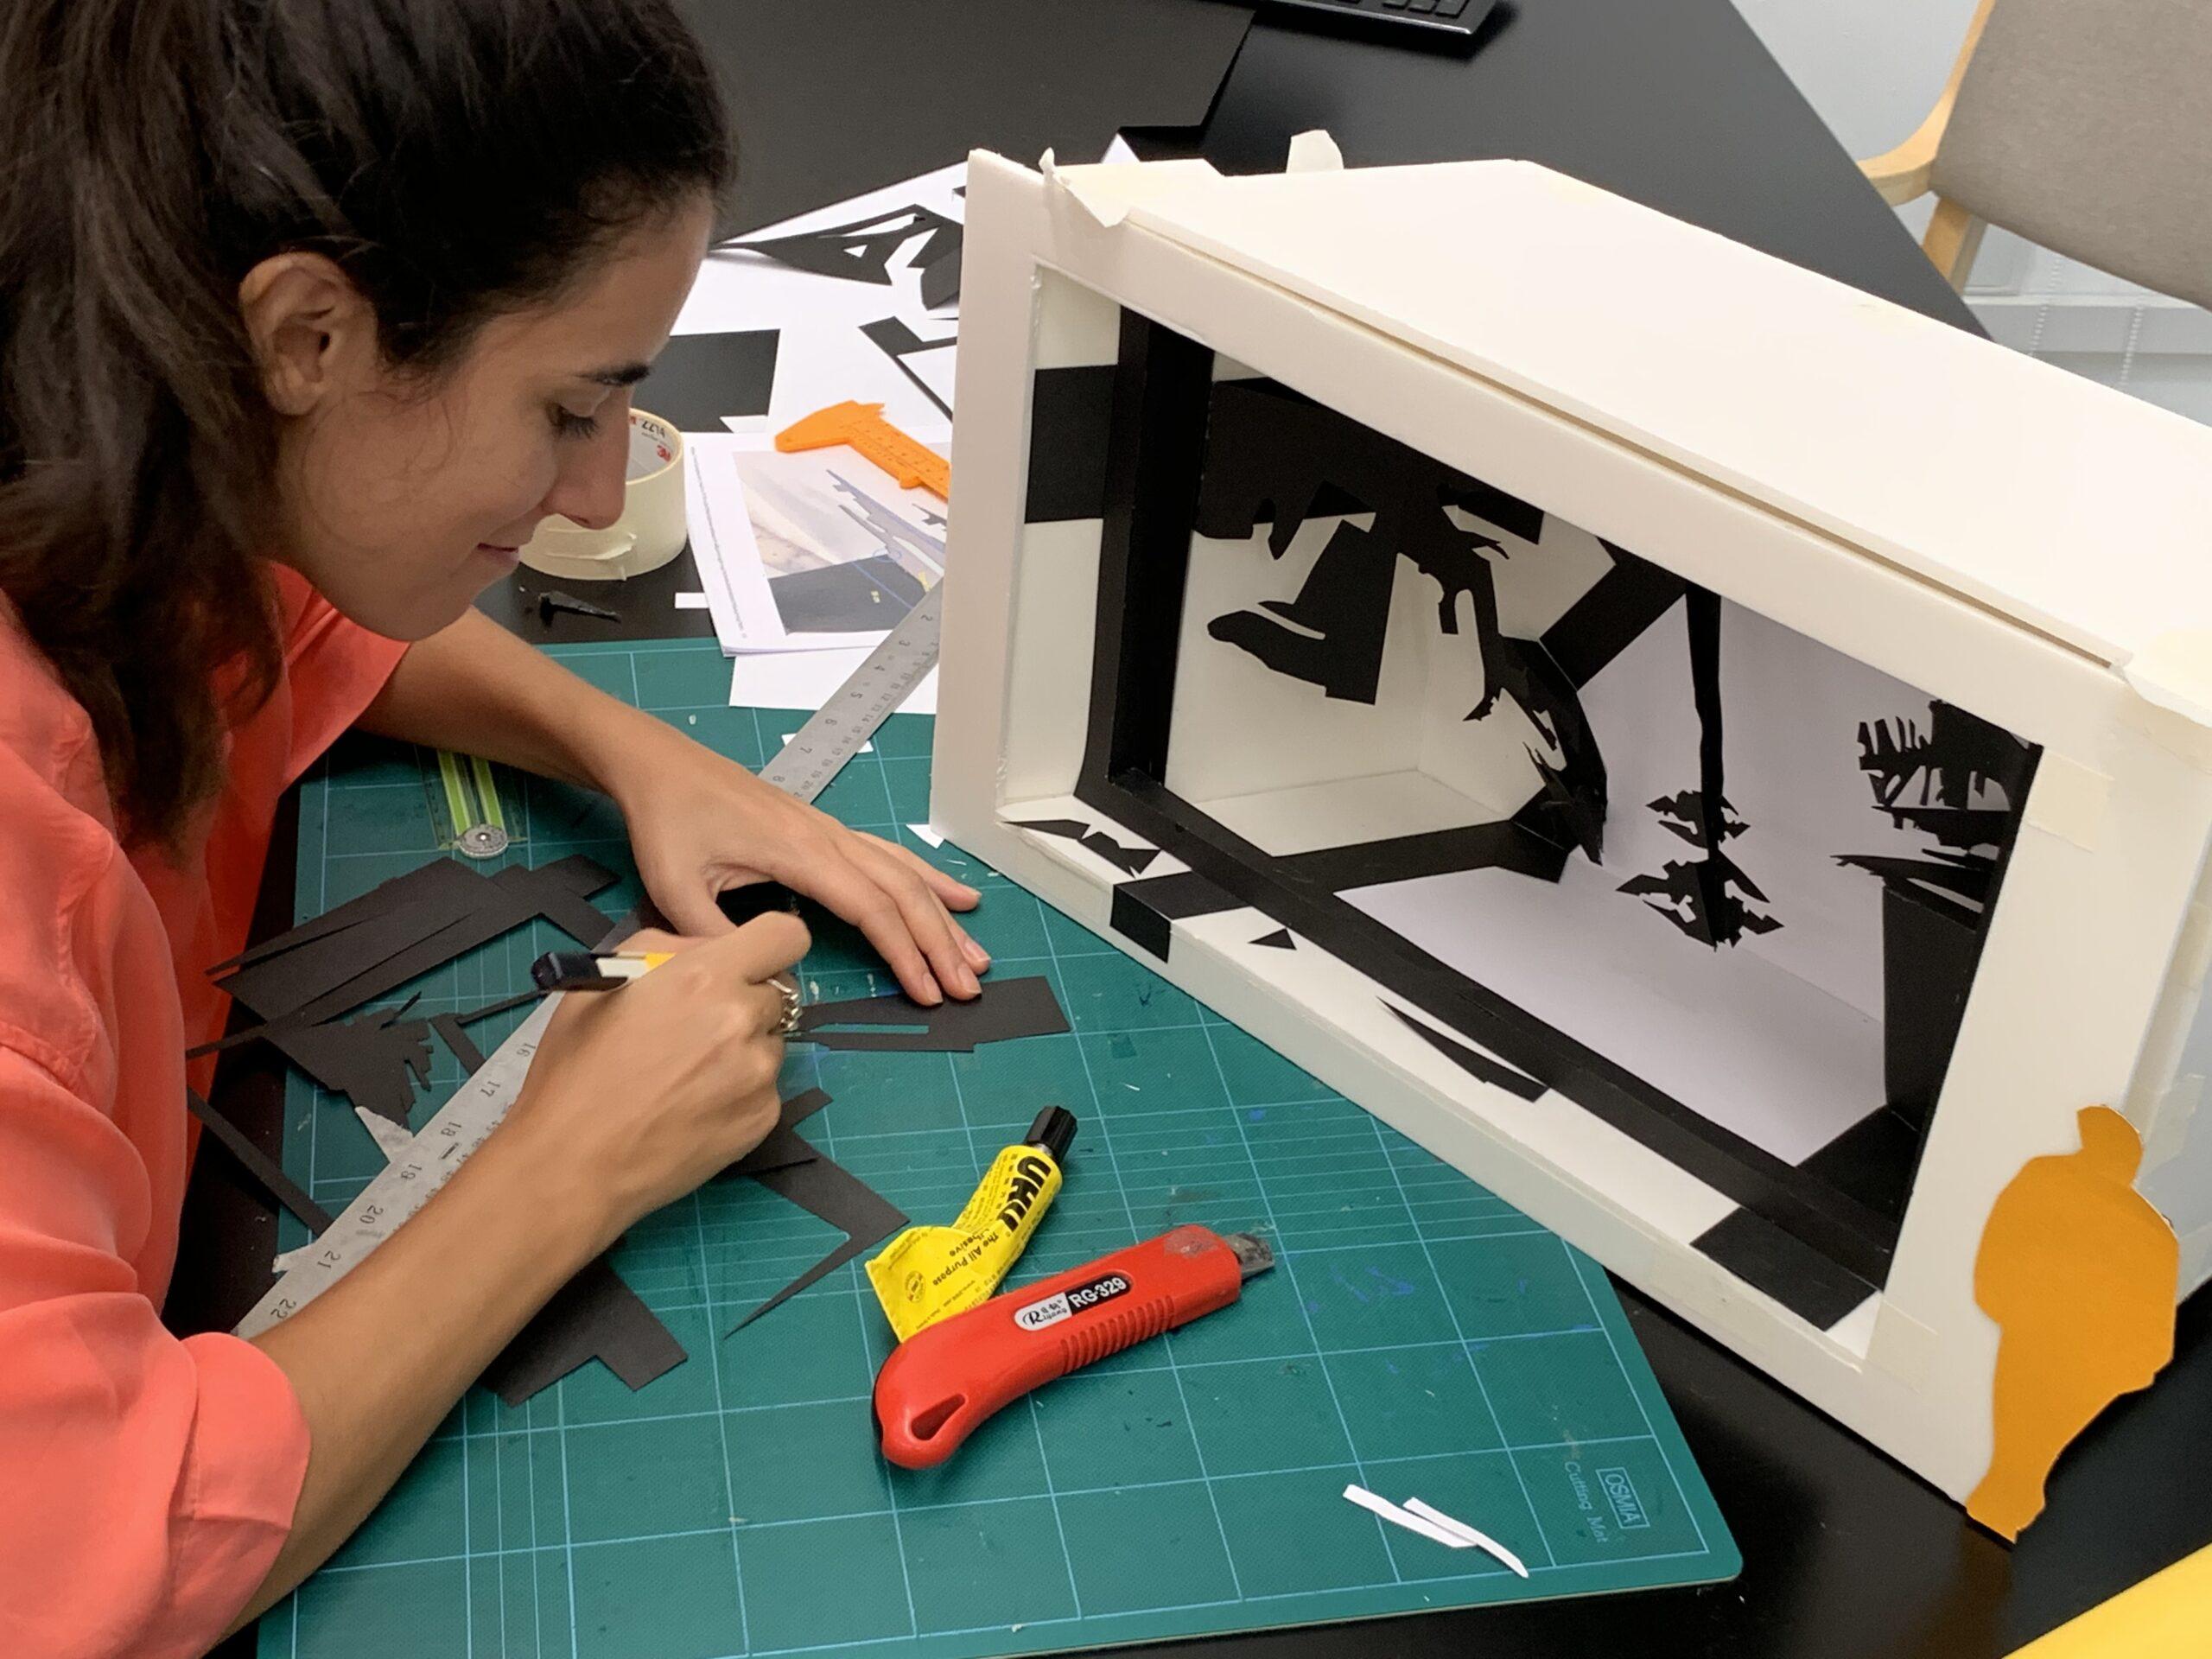 Madalena working on the SFH model, Impromptu Inc Macau